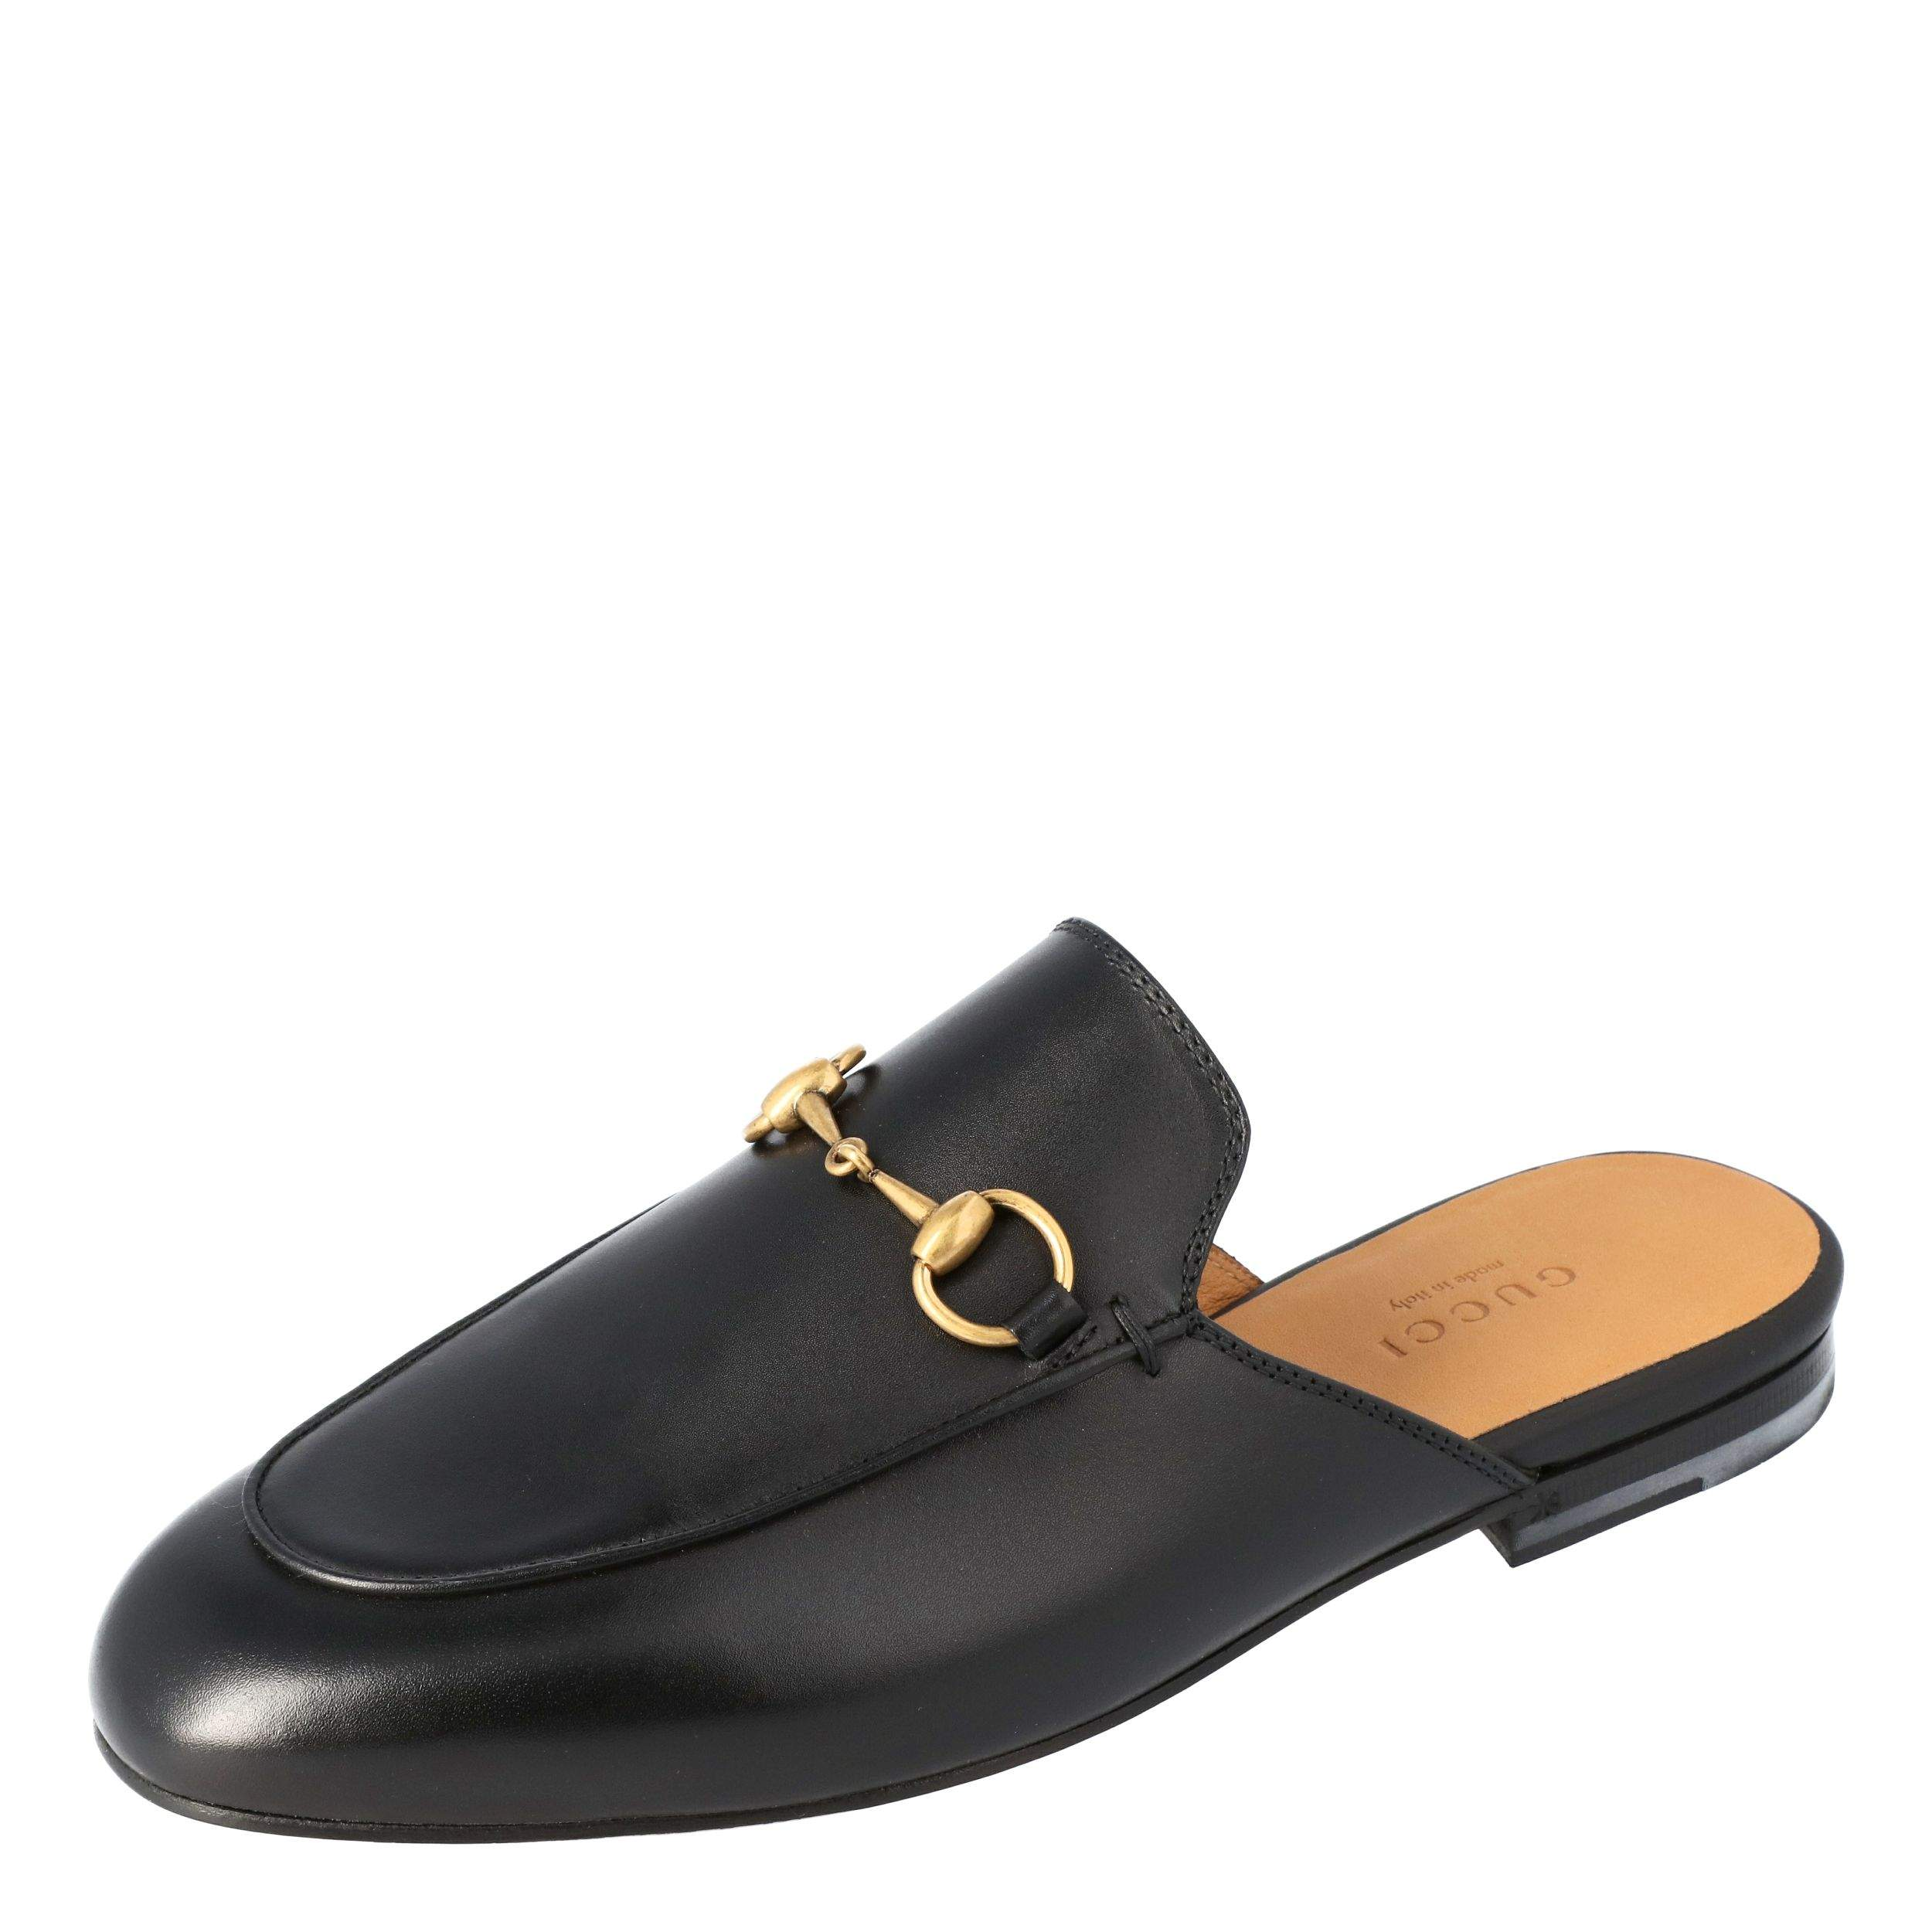 Gucci Black Leather Princetown Horsebit